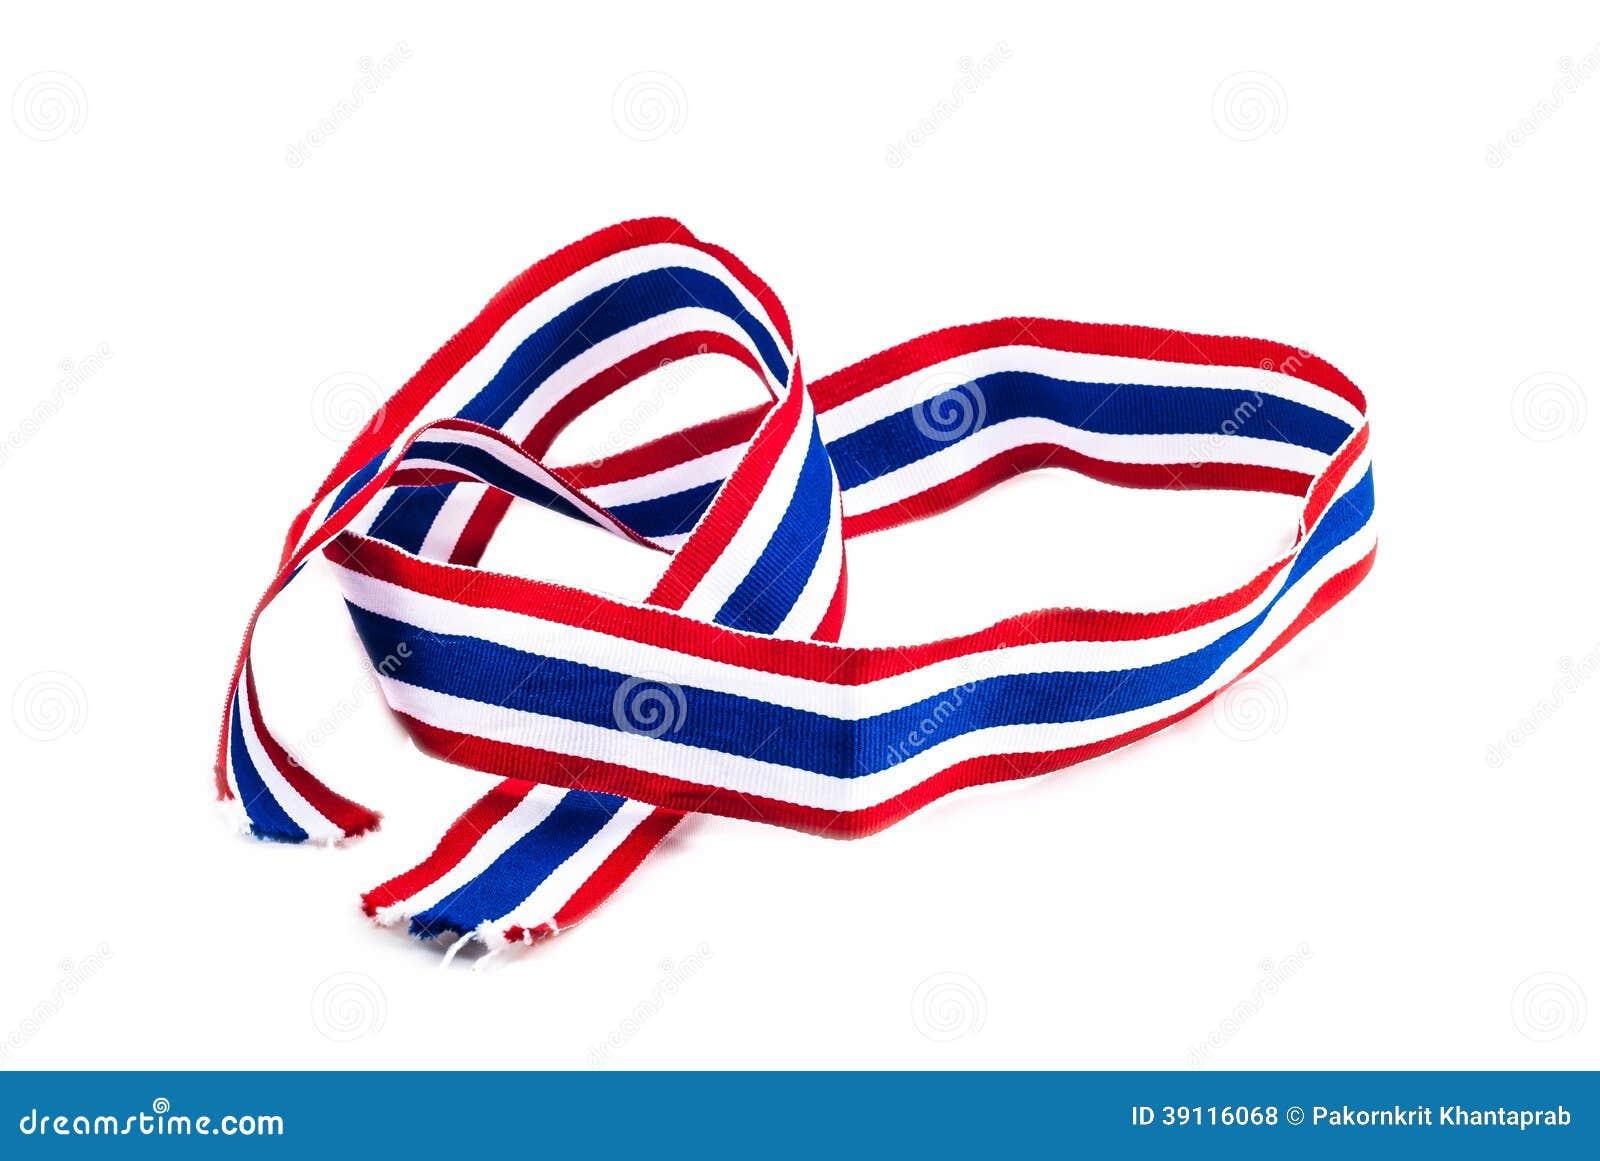 Nationaal de Vlaglint van Thailand